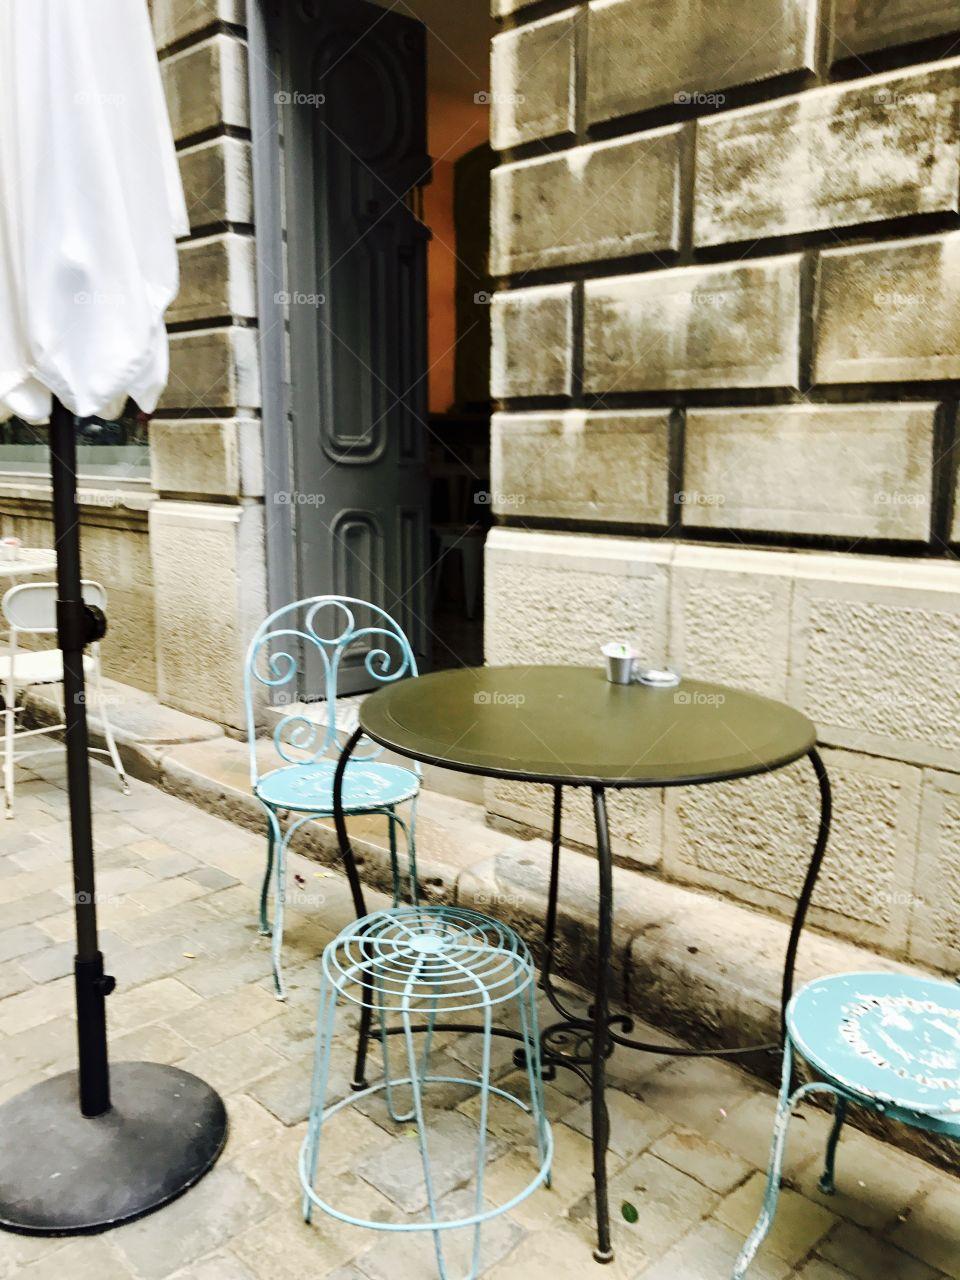 #outdoors #coffee #tea #table #chairs